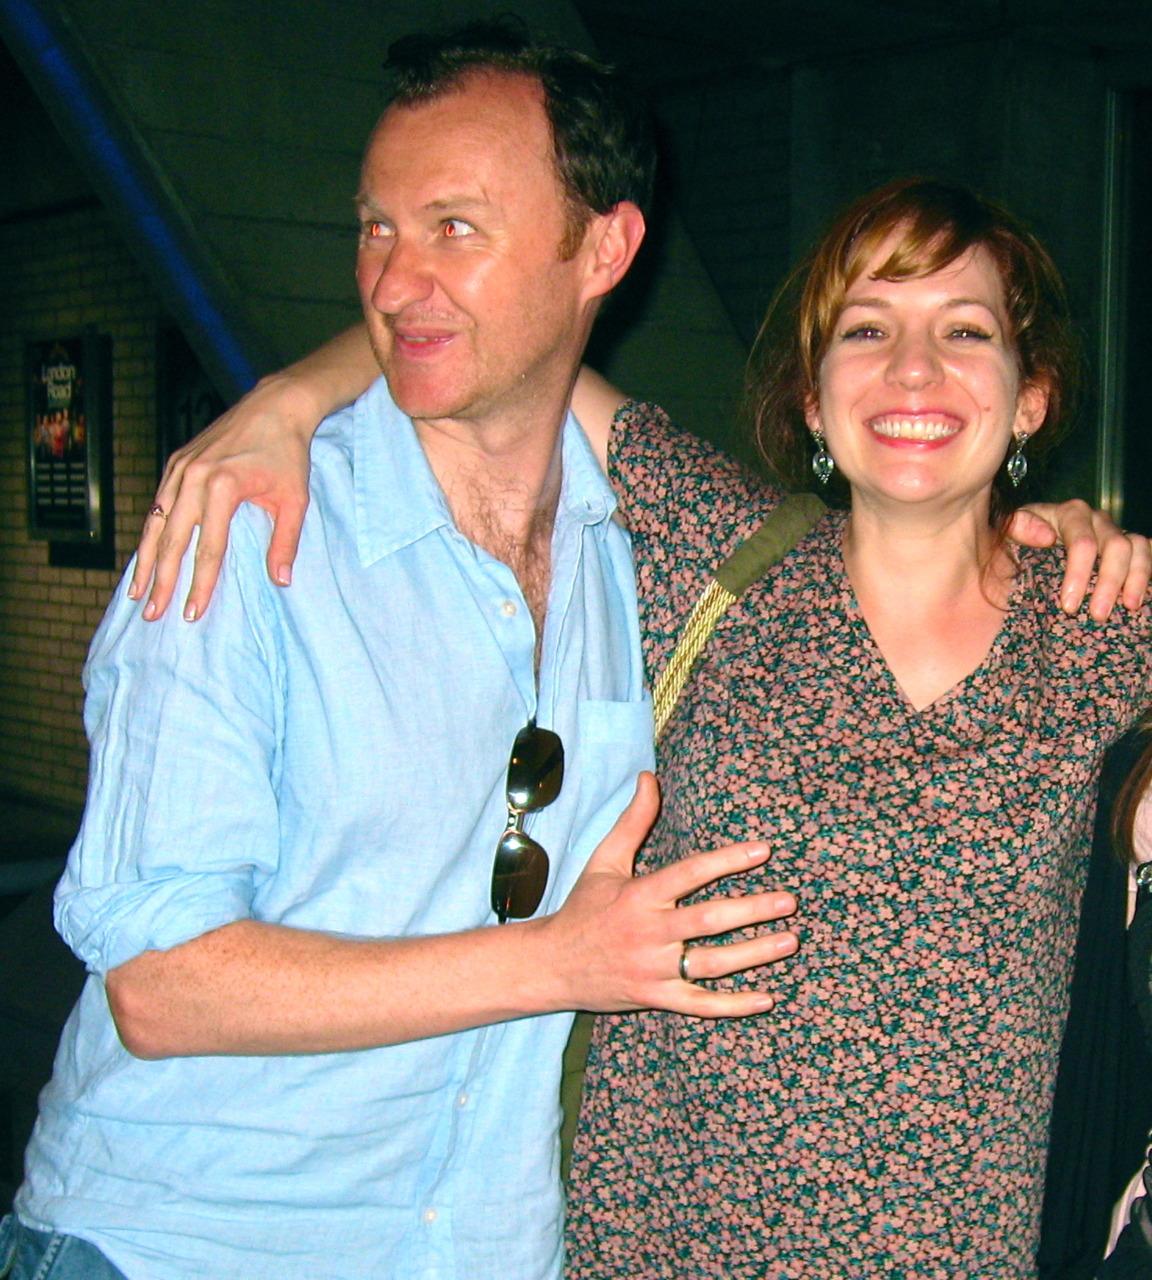 Katherine Parkinson & Mark Gatiss